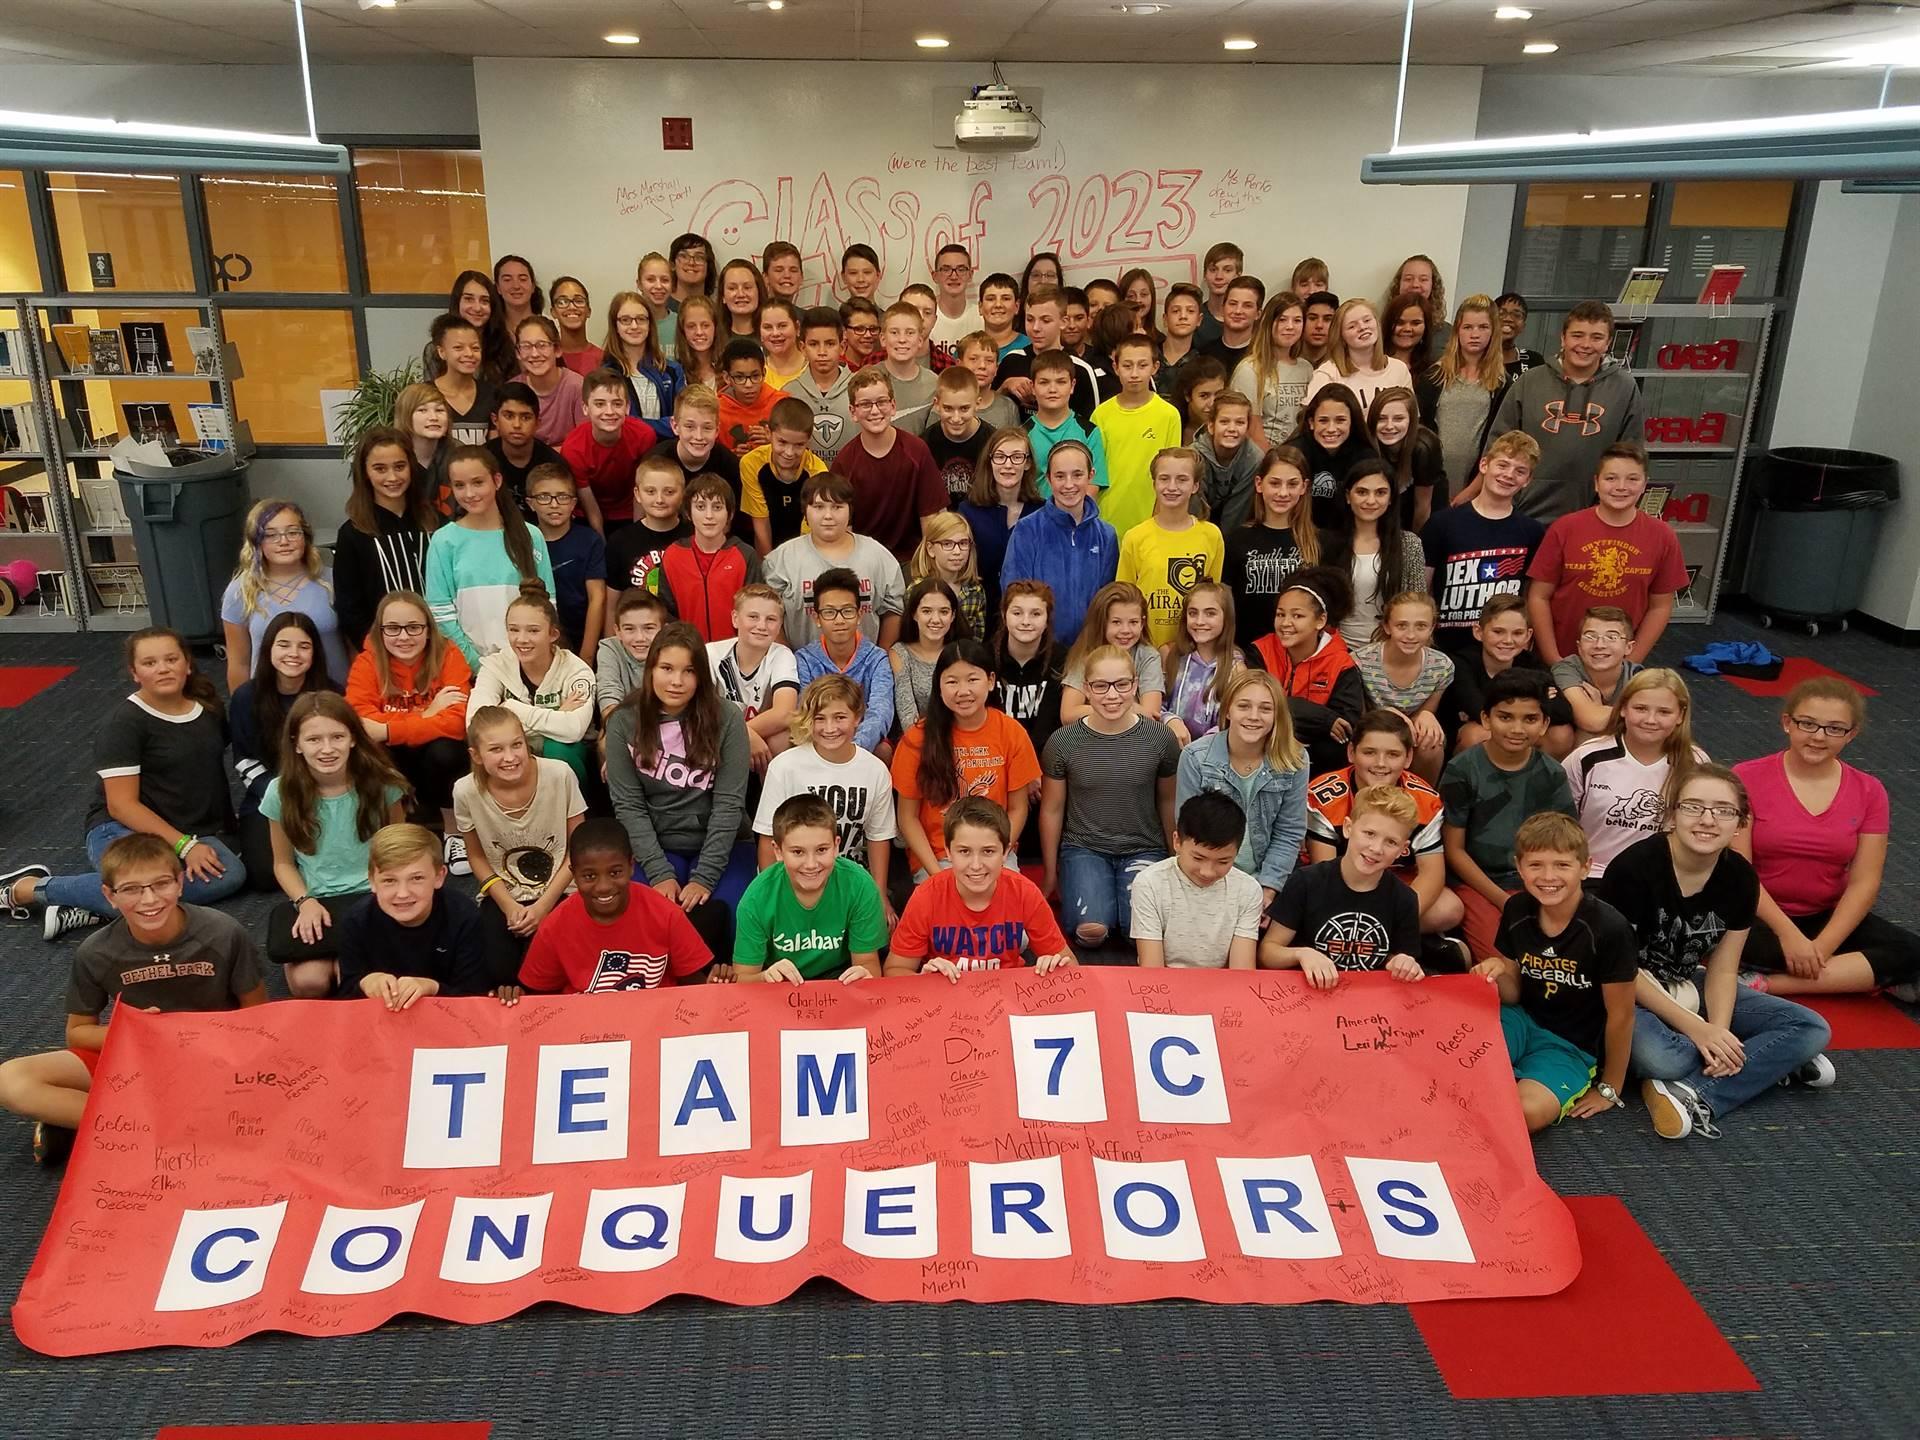 Team 7C and their team banner